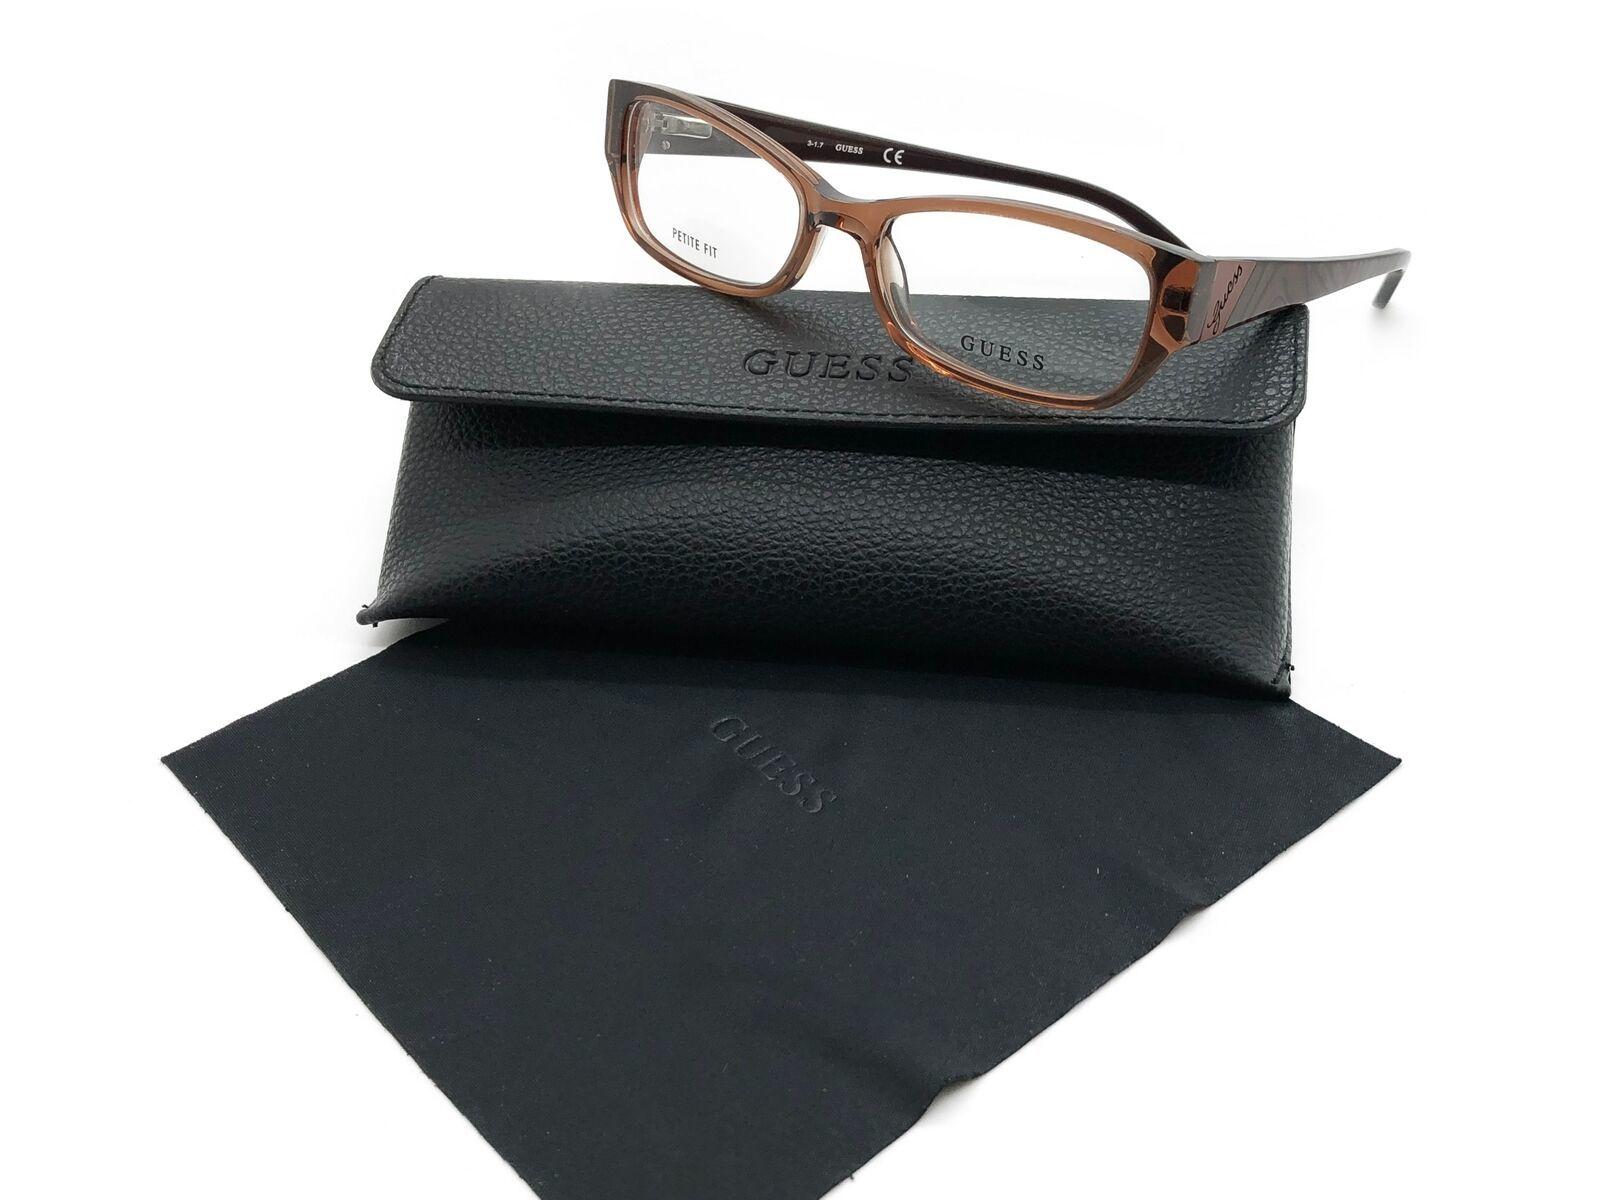 Guess Brown Eyeglasses Frame Remove Demo lenses for RX GU2305 V BRN 52MM